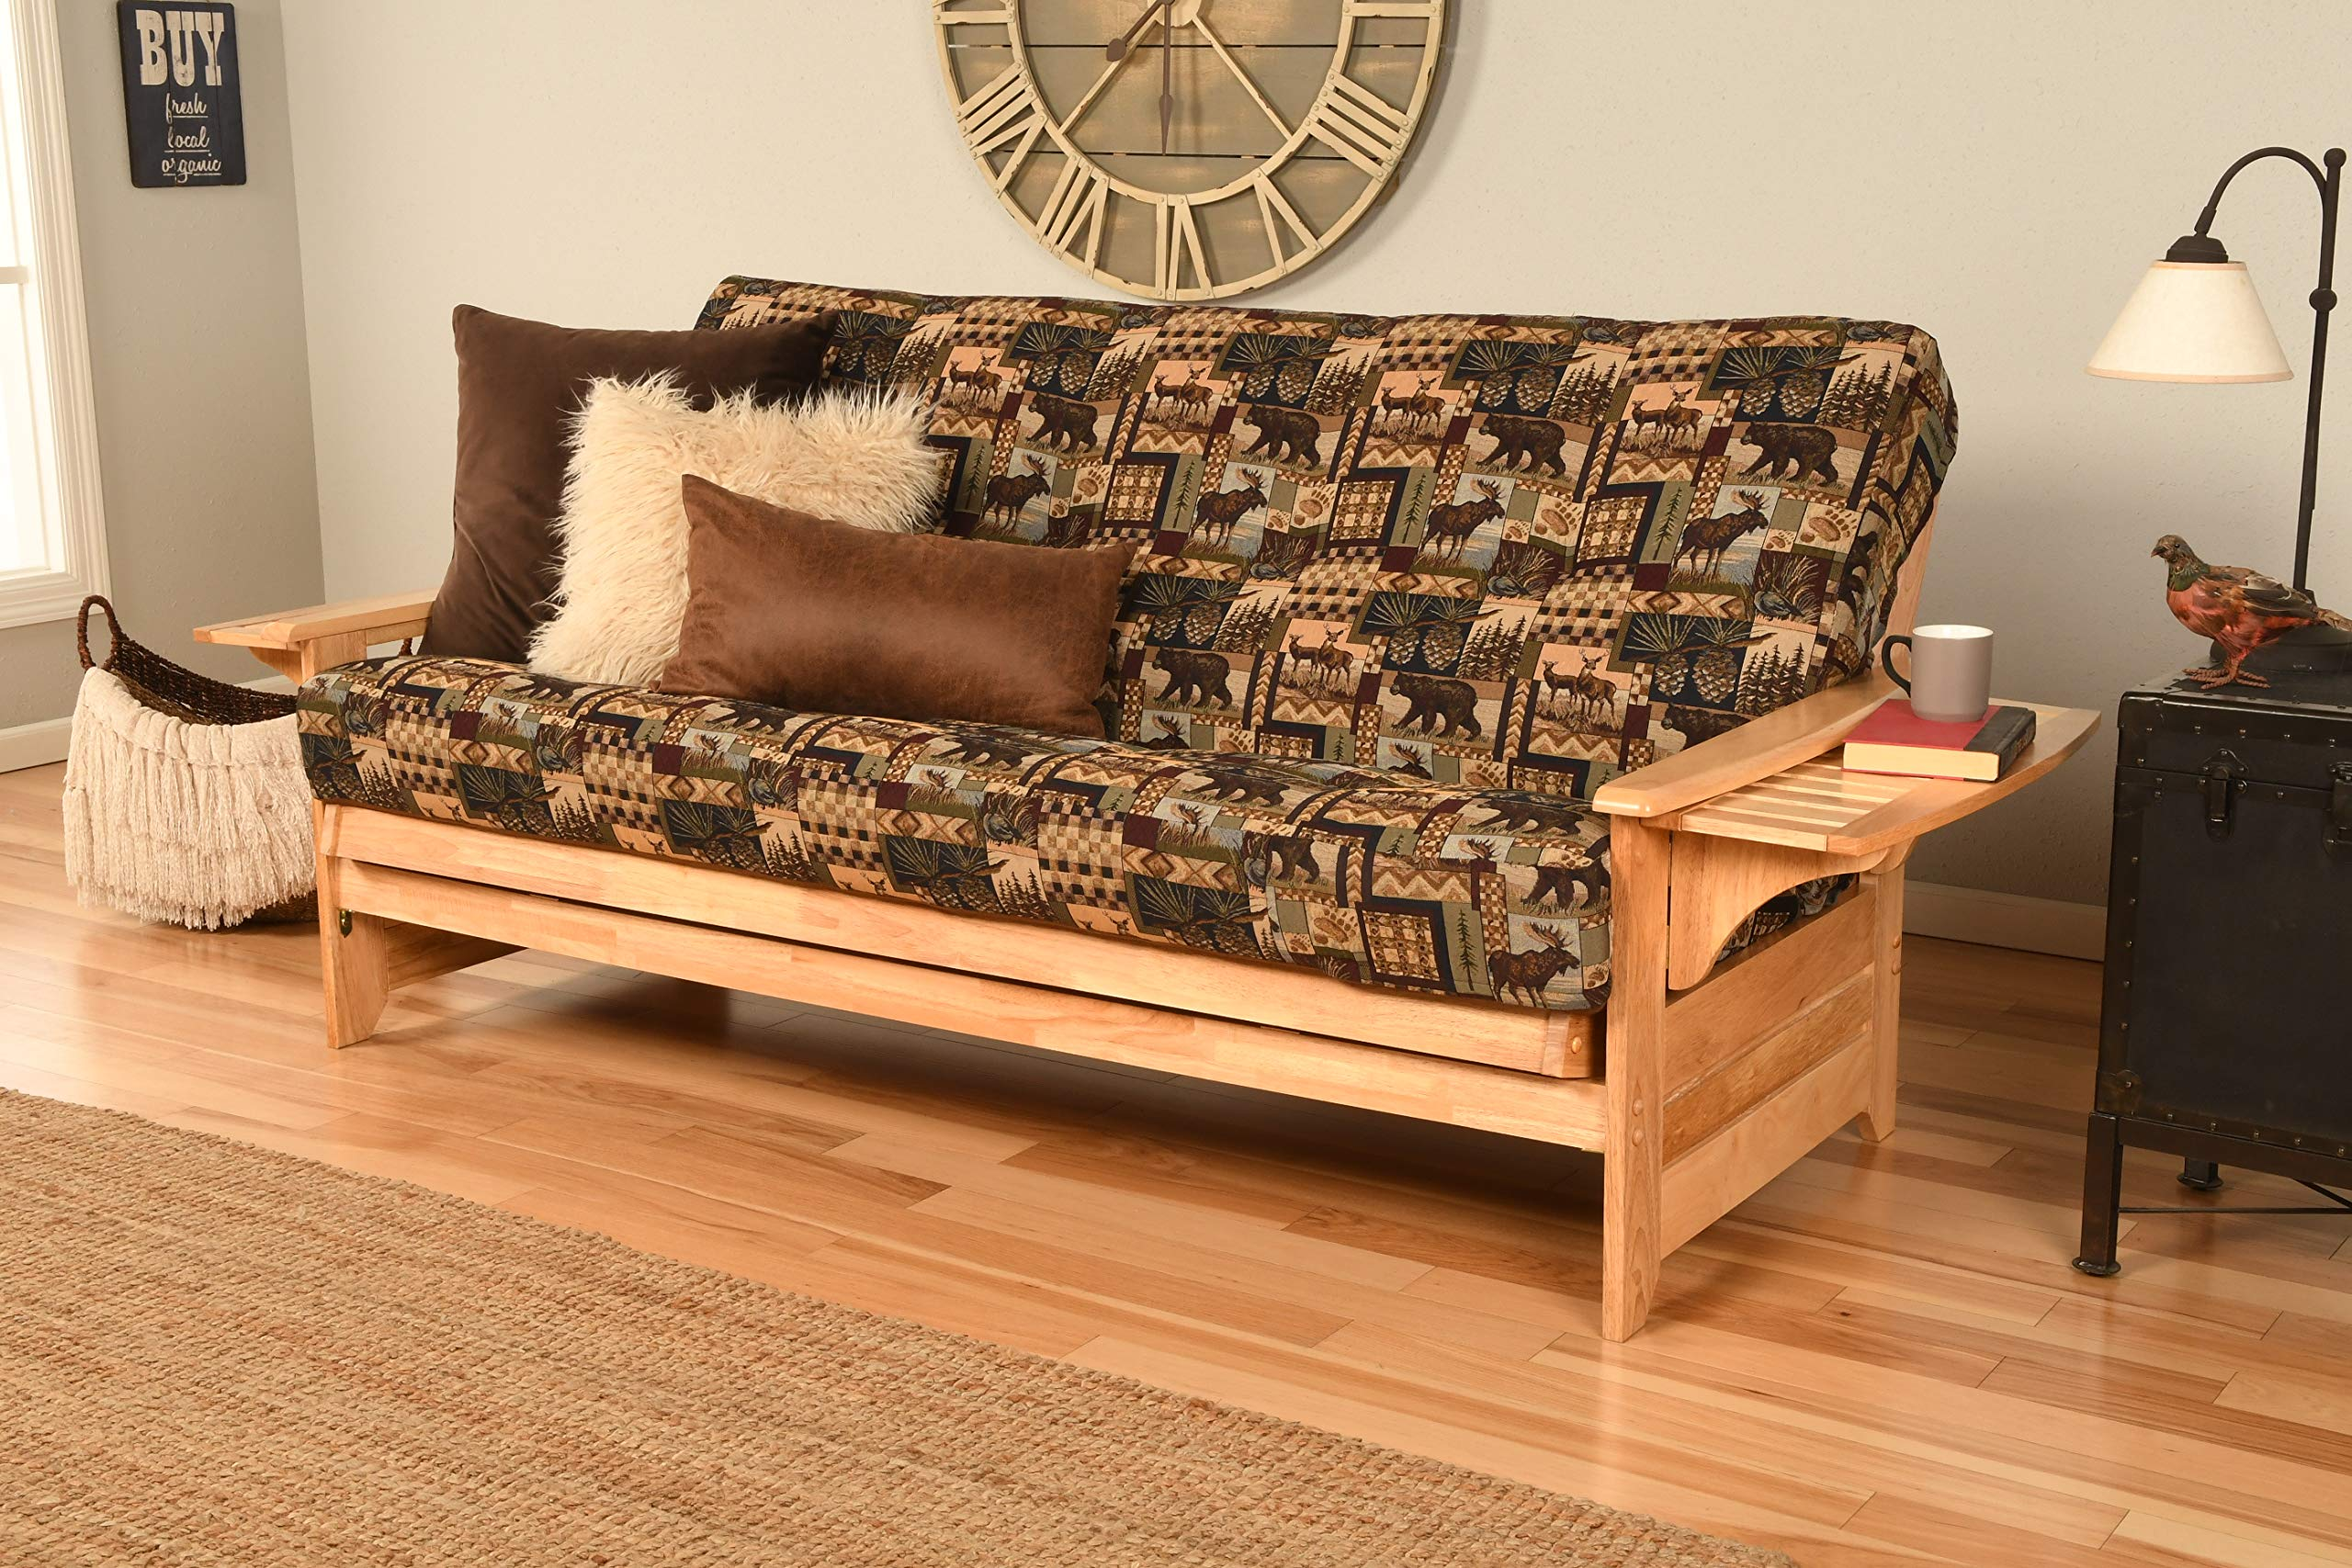 Phoenix Futon Sofa in Natural Finish with Peter's Cabin Mattress by Kodiak Futons